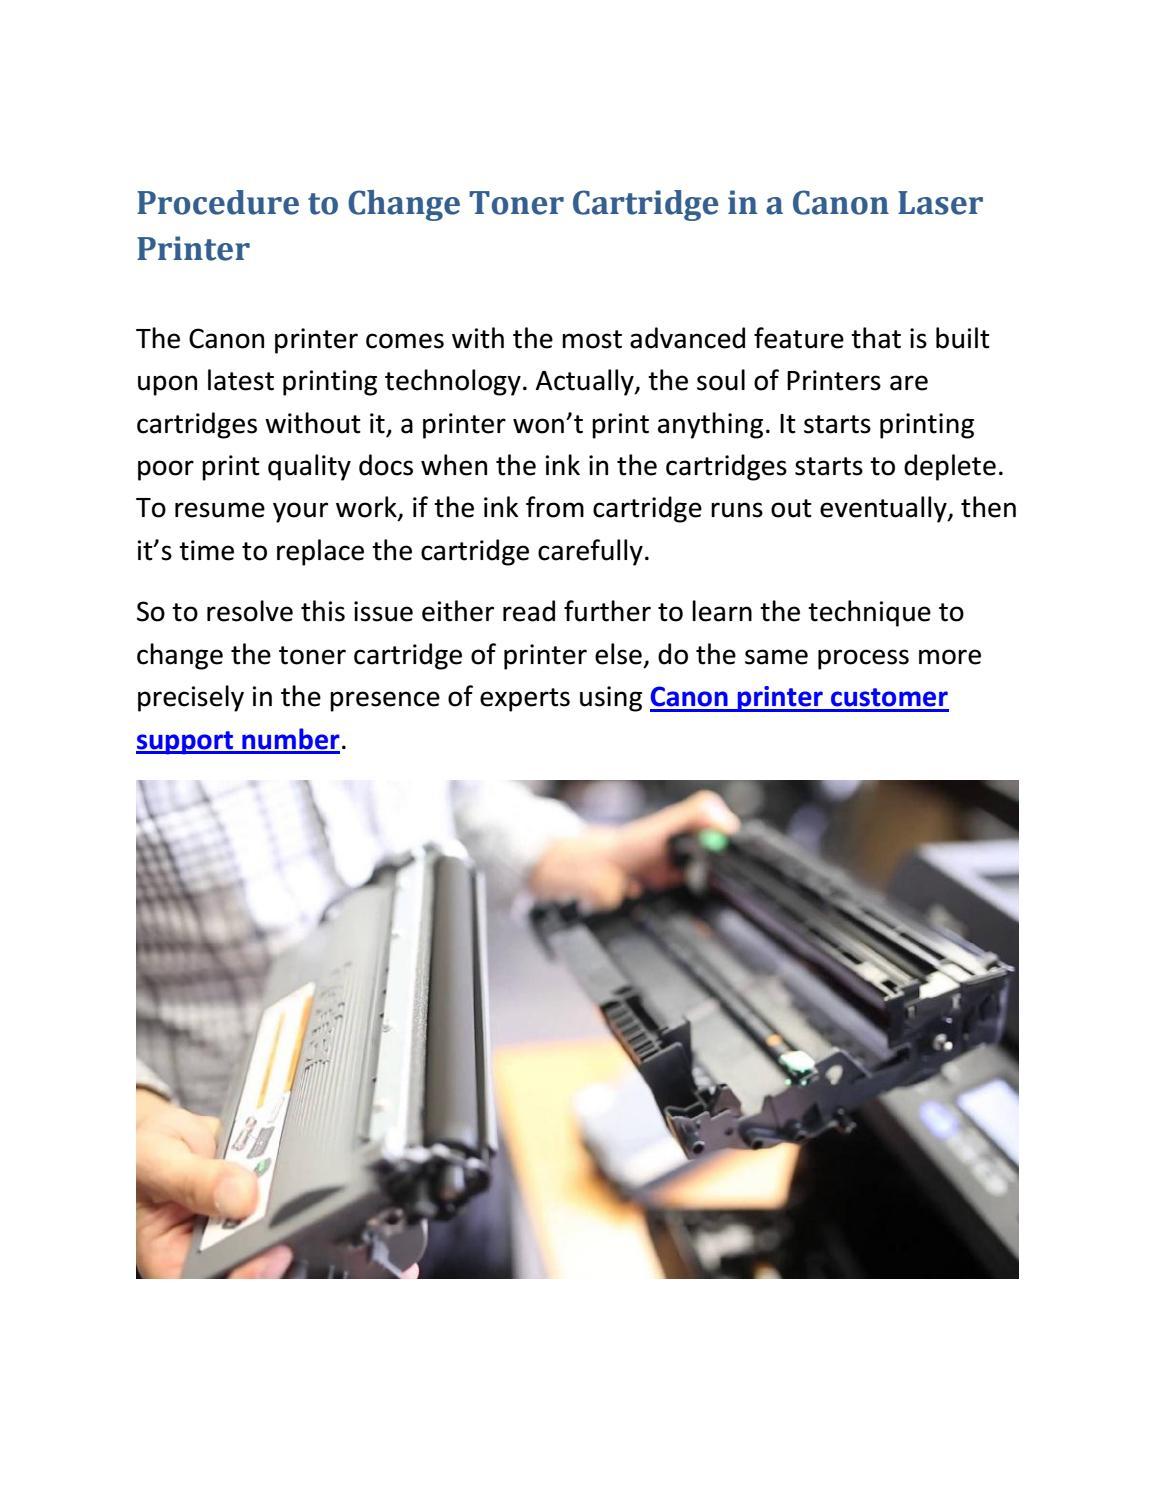 Procedure to change toner cartridge in a canon laser printer